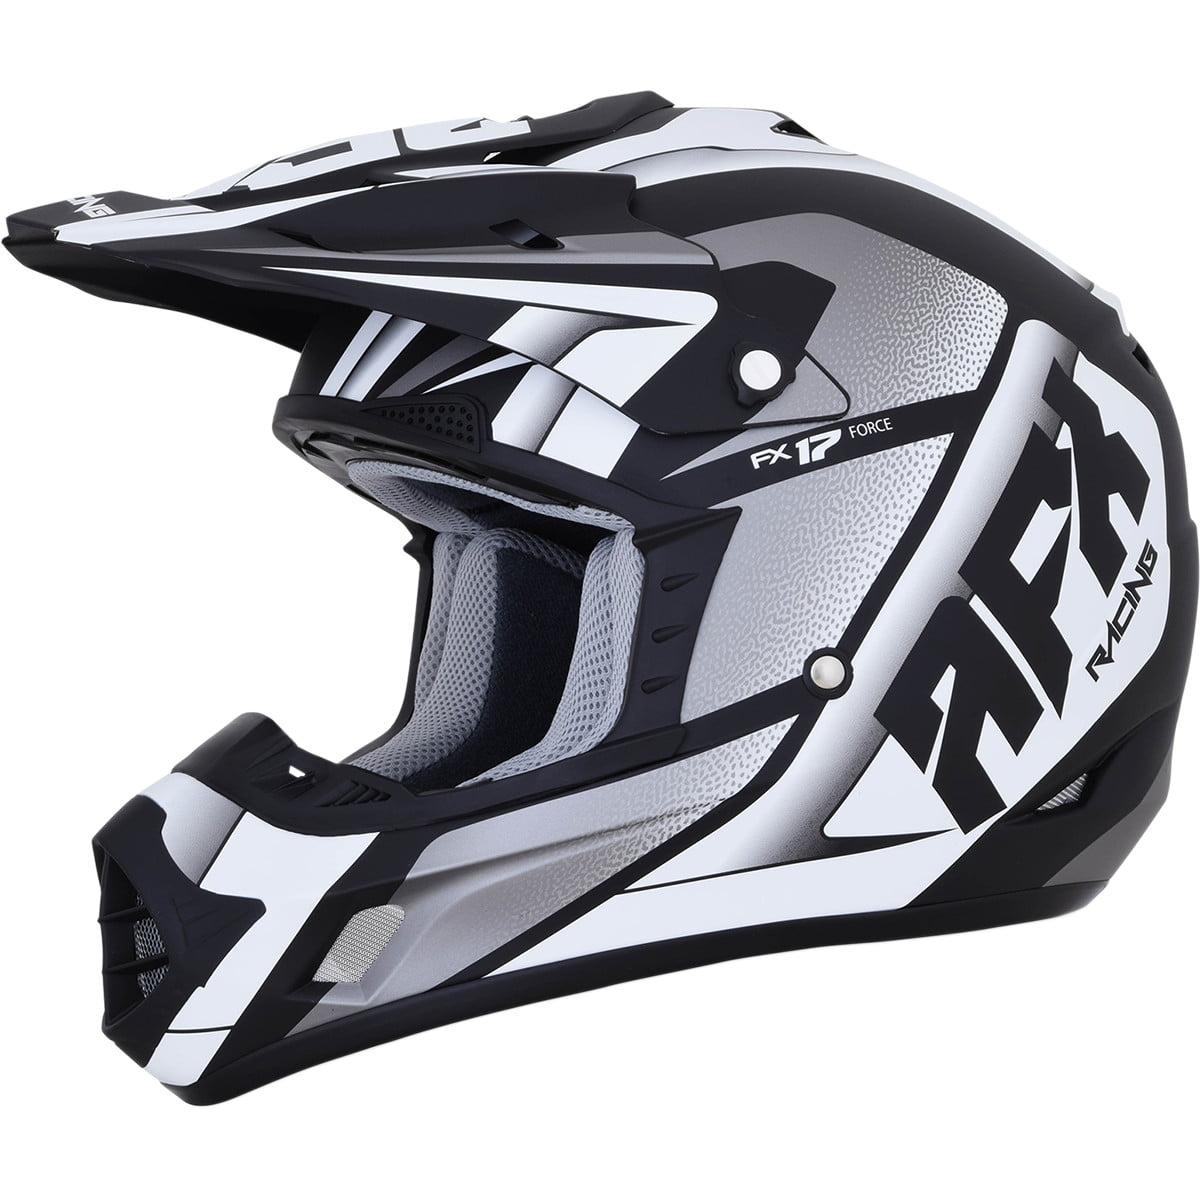 AFX FX-17 Offroad Helmet (Force Black/White Matte, X-Small)